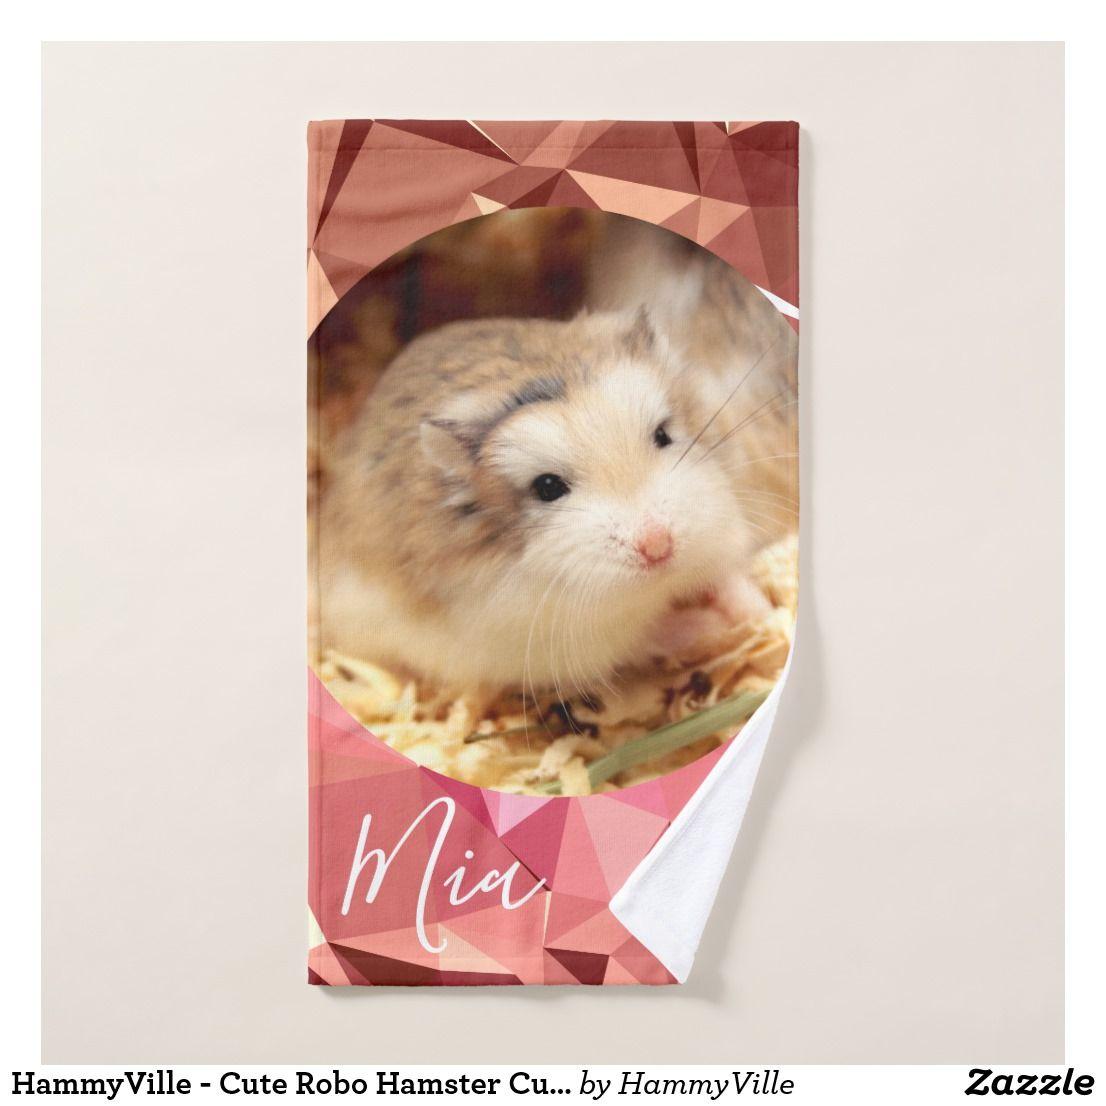 Hammyville Cute Robo Hamster Customize Name Bath Towel Set